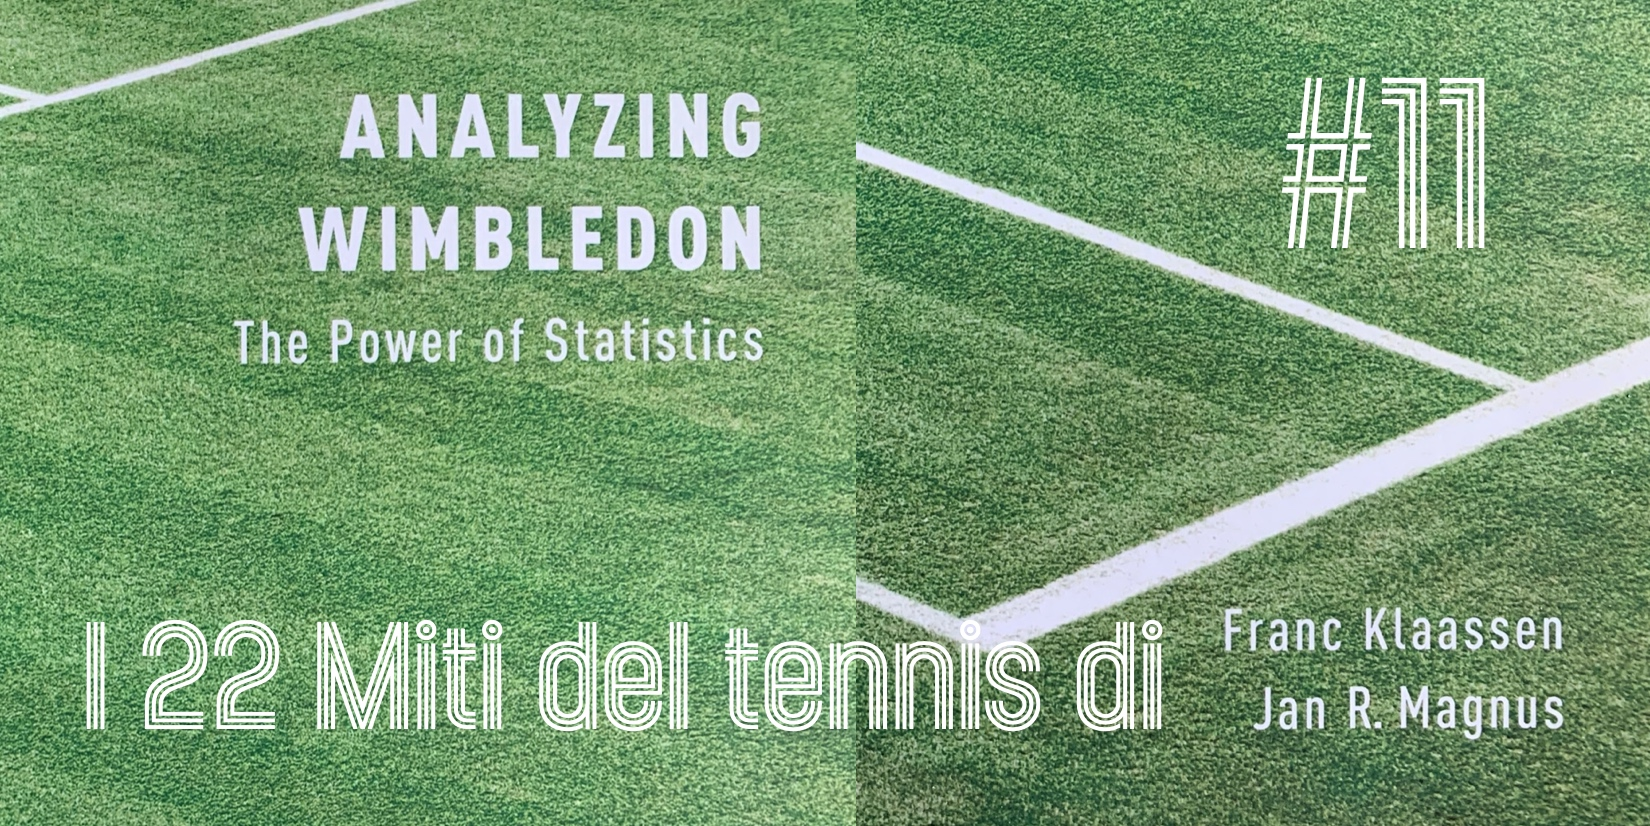 I 22 miti del tennis di Klaassen & Magnus – Mito 11 - settesei.it